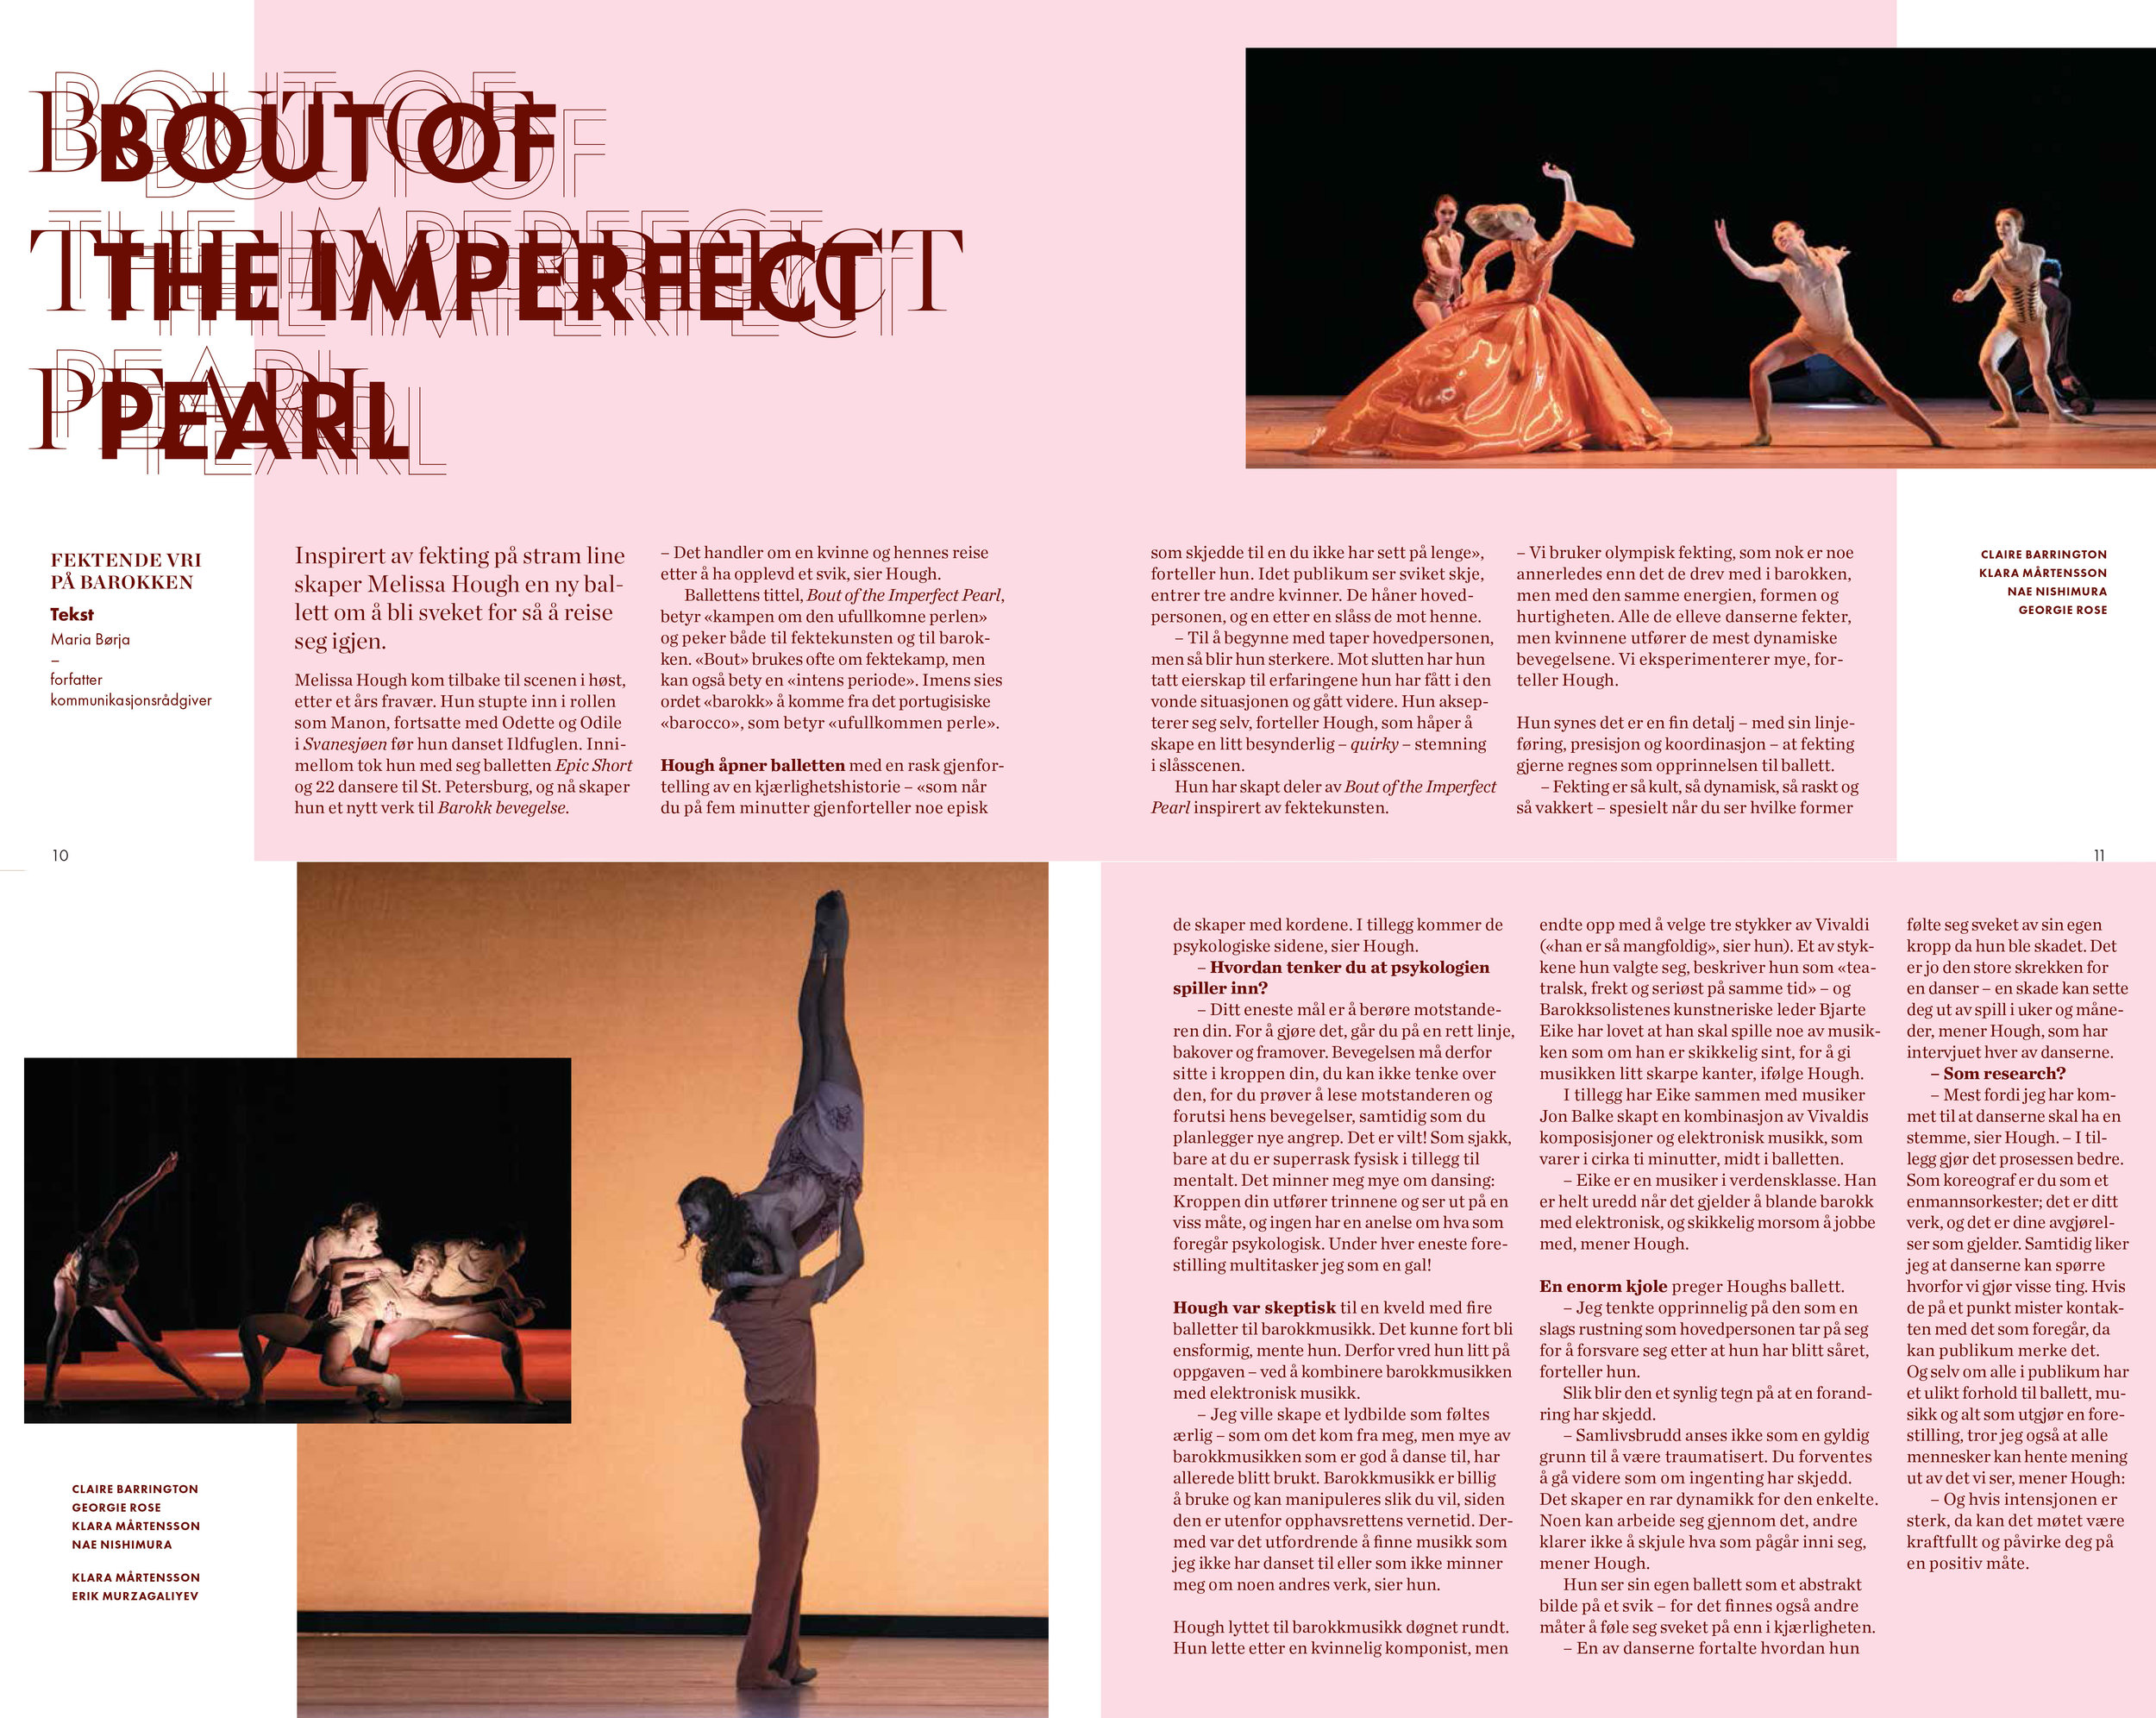 Intervju med Melissa Hough om hennes nye ballett  Bout of the Imperfect Pearl.  Faksimile fra forestillingsprogrammet, design: Live Molvær, foto: Erik Berg